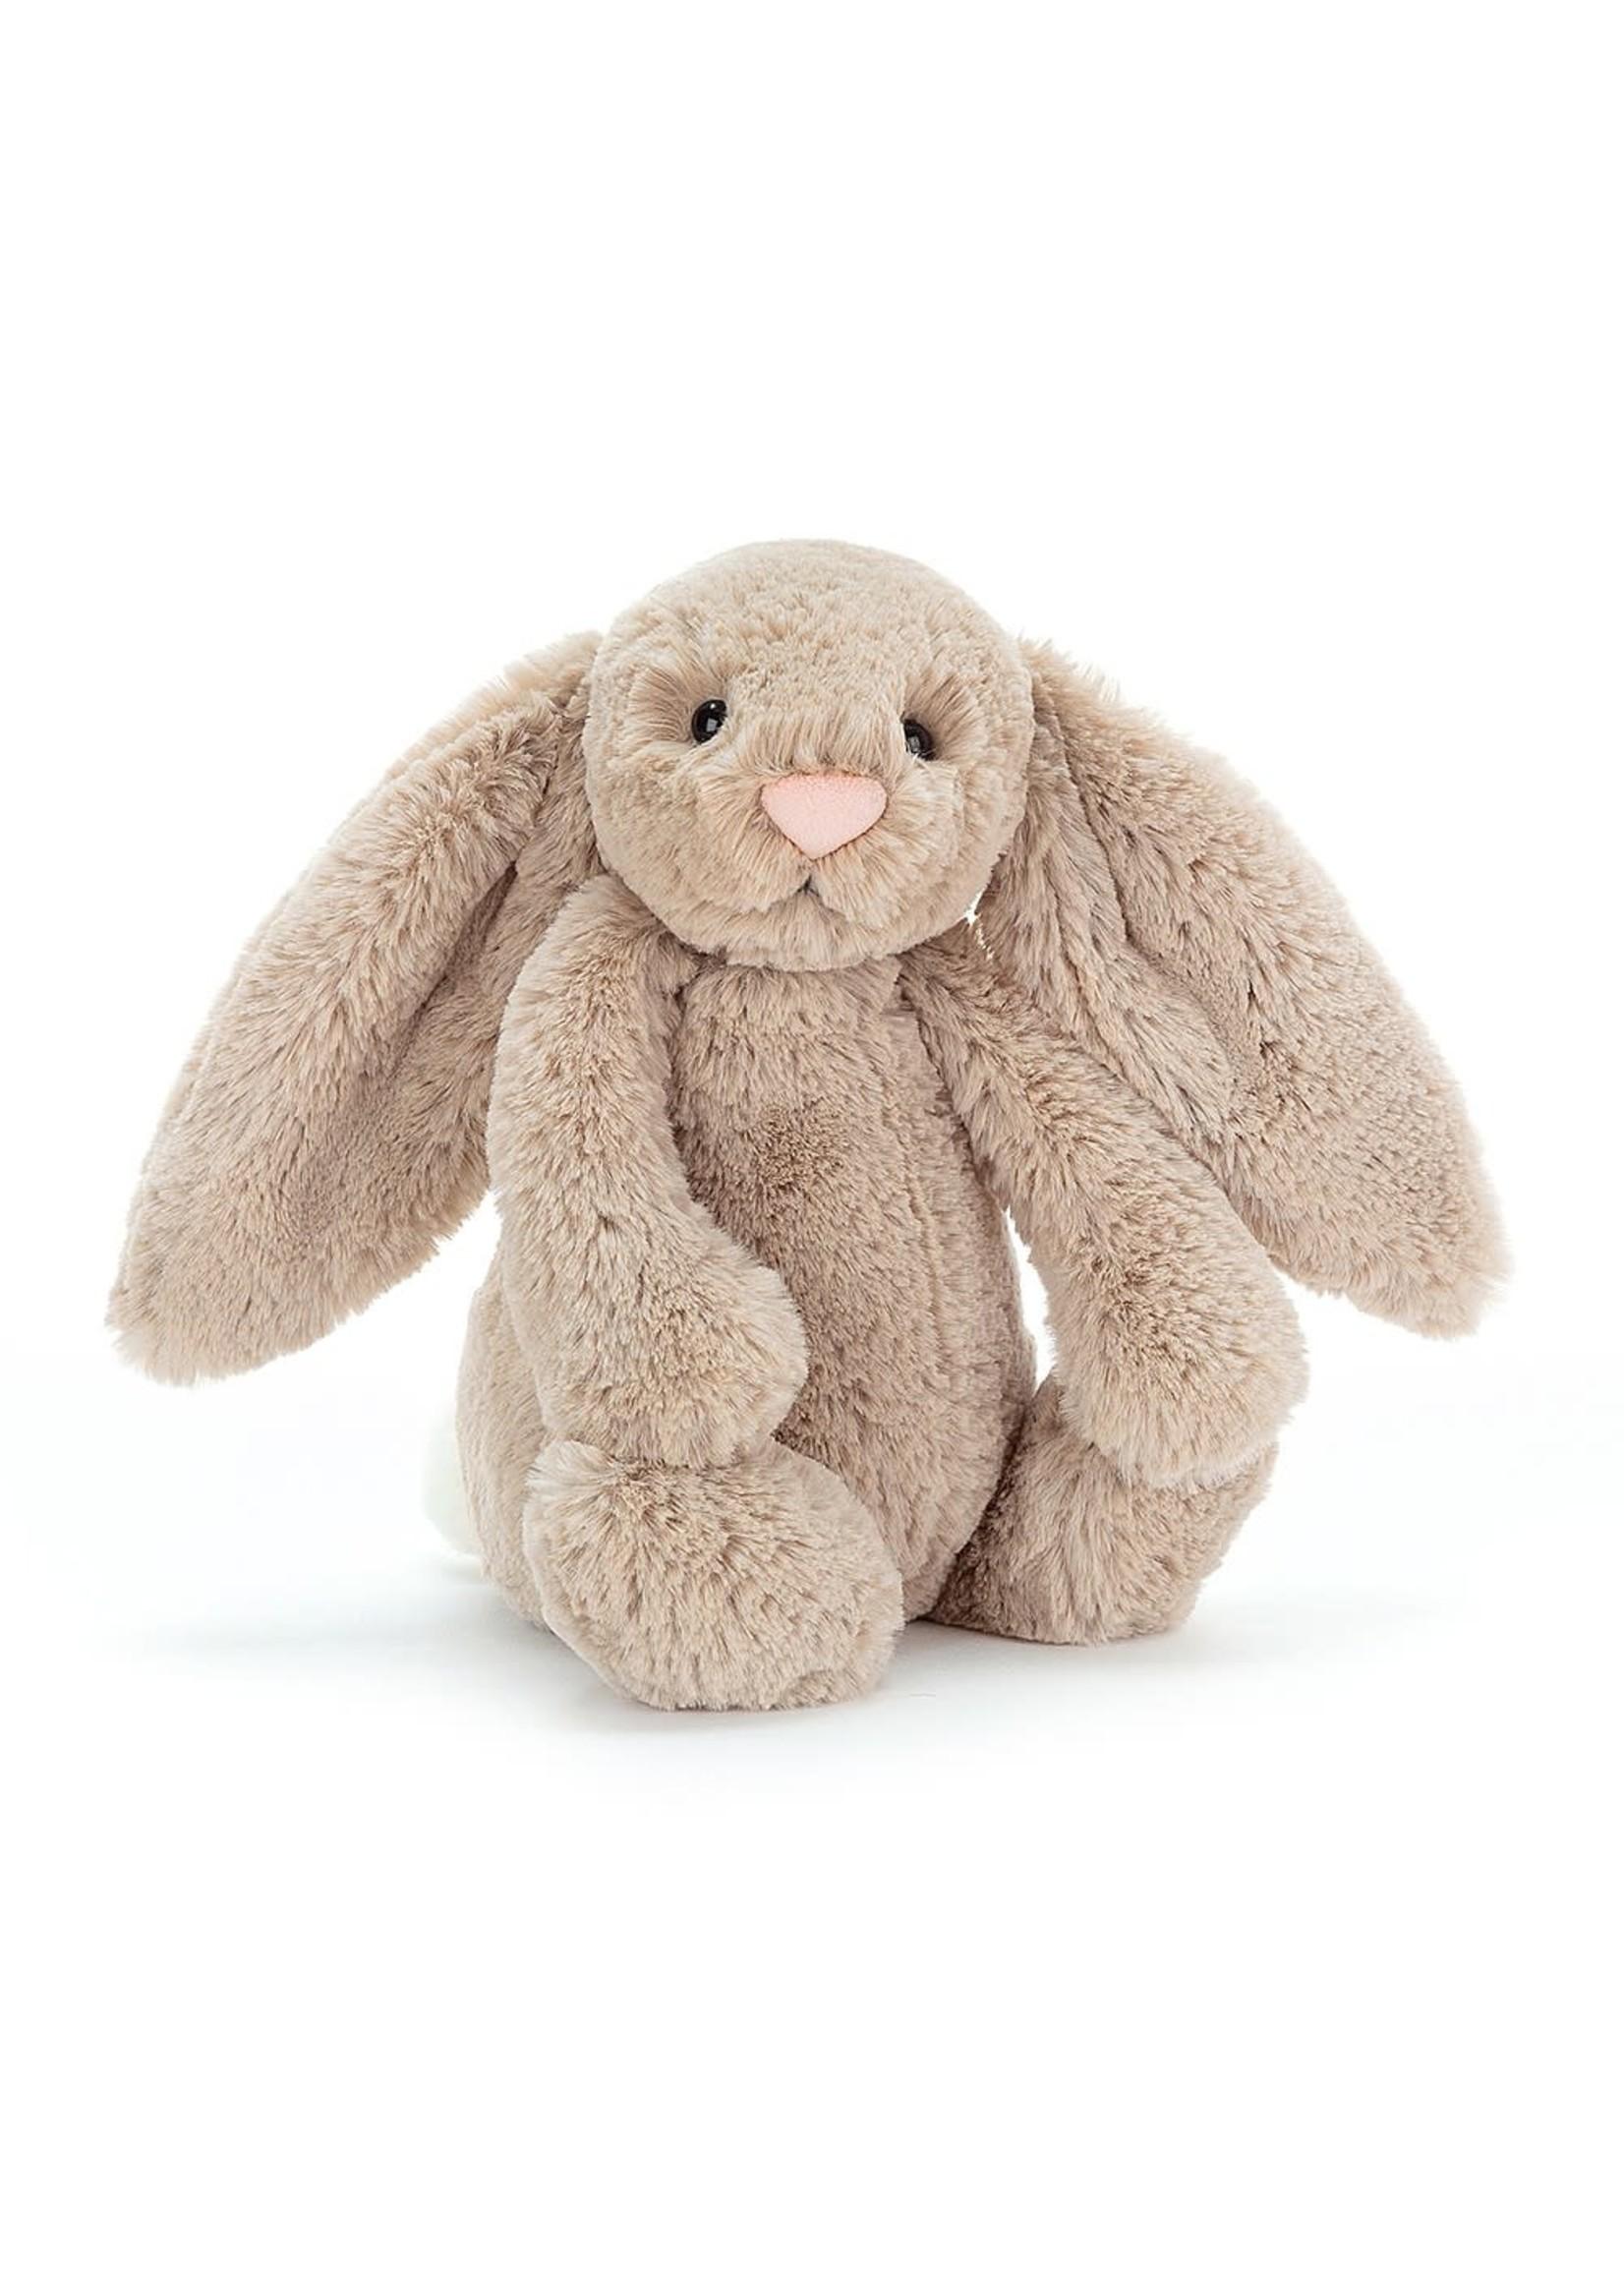 Jellycat JC Medium Bashful Bunny Beige